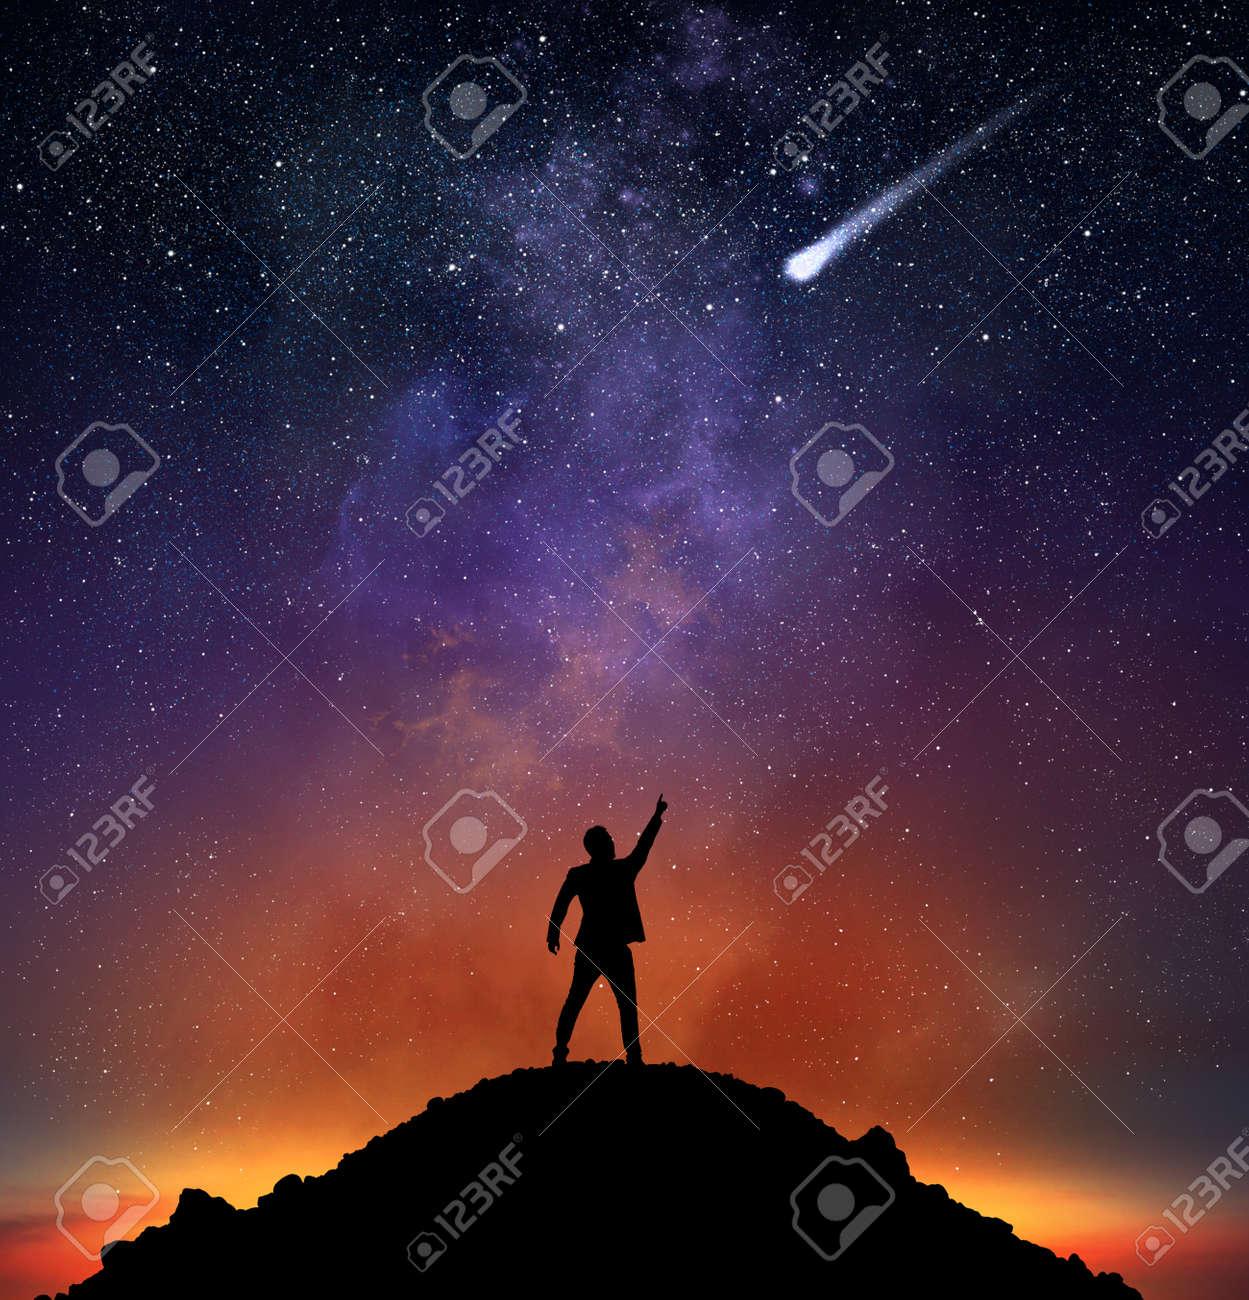 Businessman on a mountain indicate a falling star Standard-Bild - 62101419